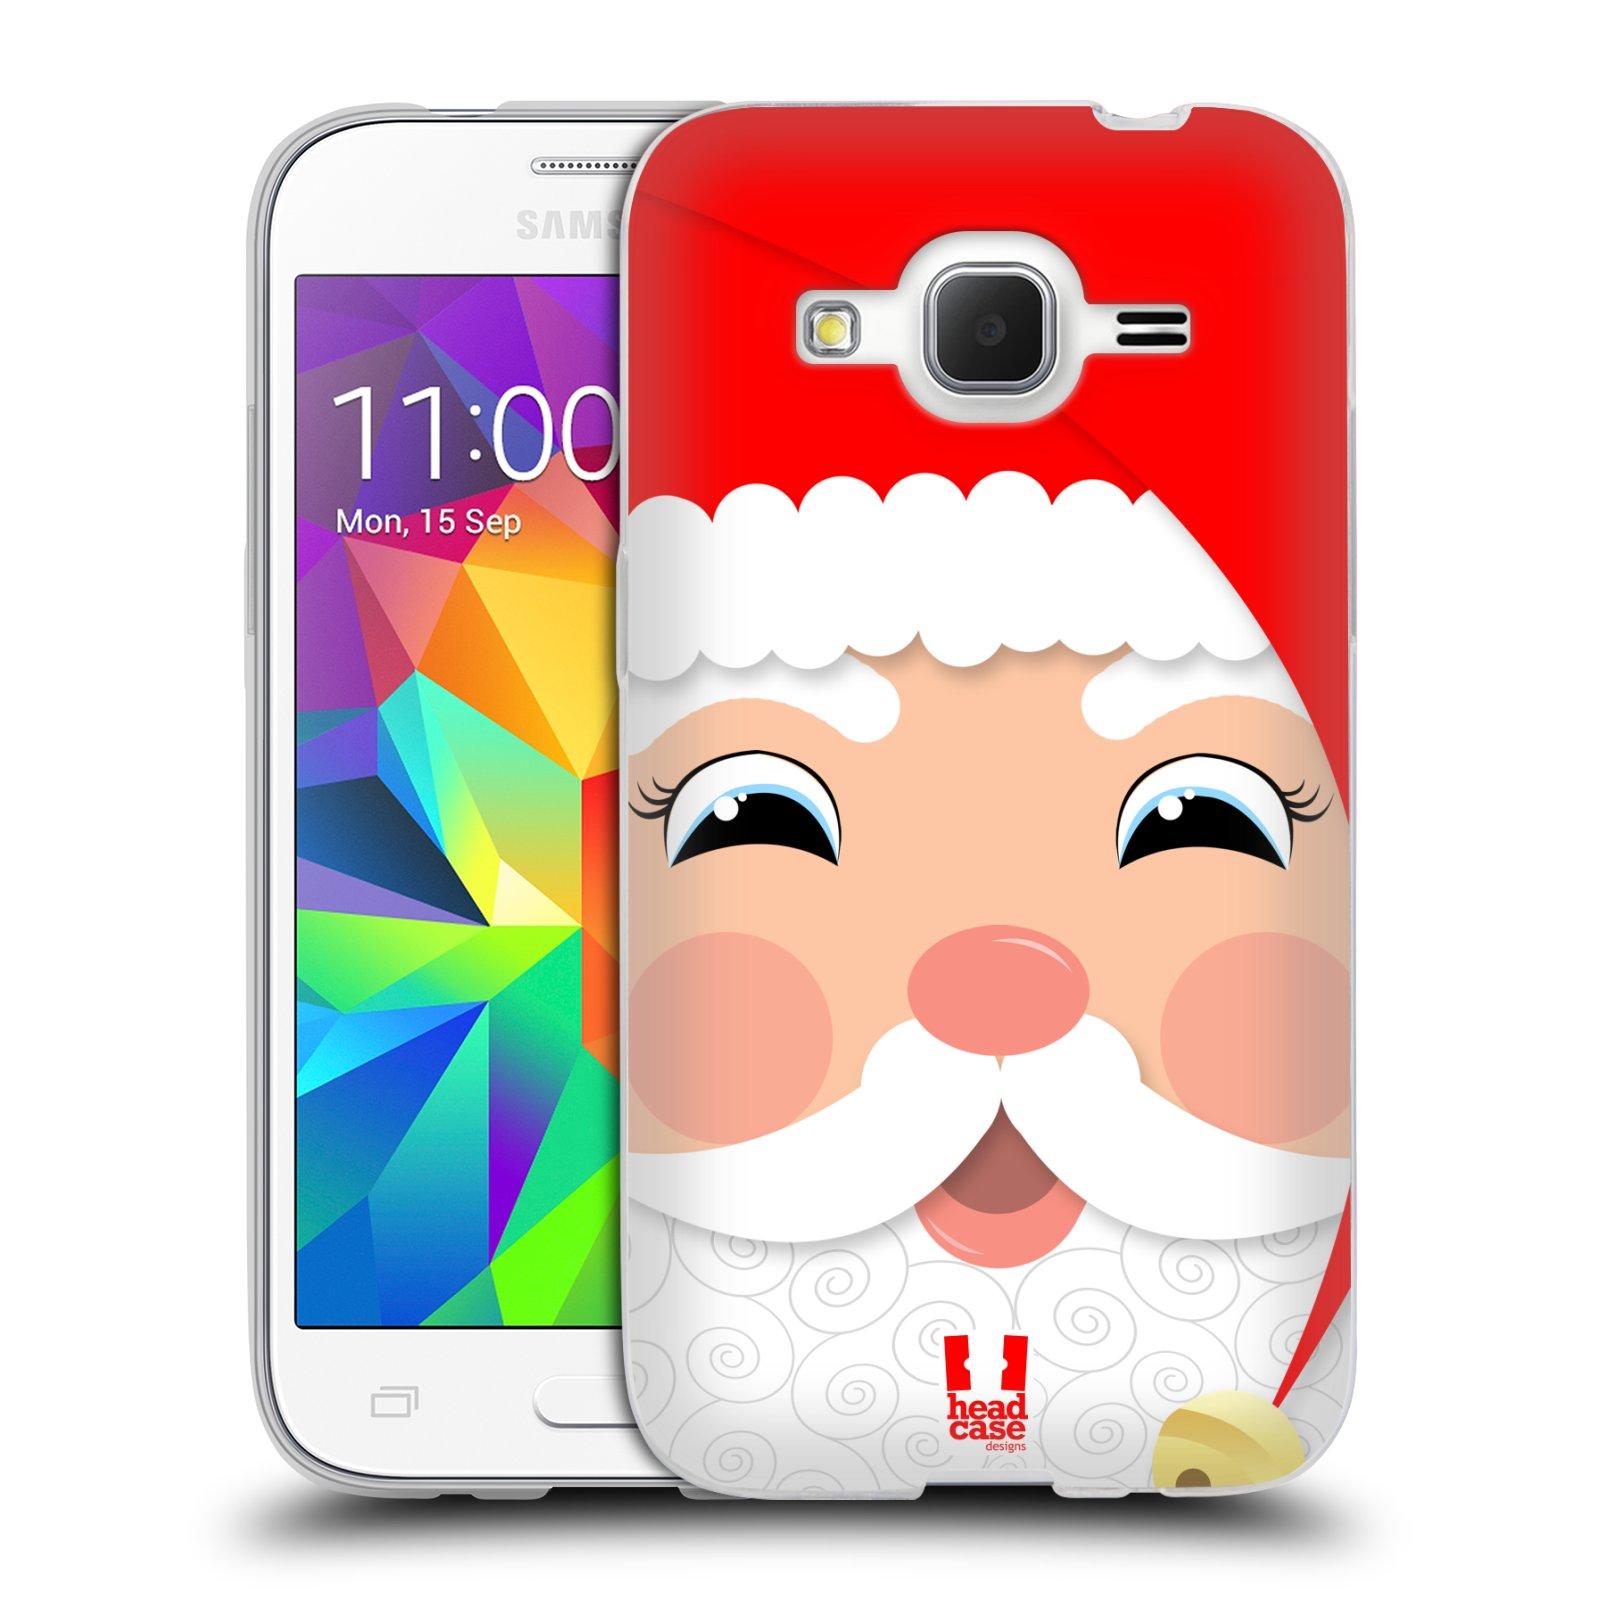 HEAD CASE silikonový obal na mobil Samsung Galaxy Core Prime (G360) vzor Vánoční tváře kreslené SANTA CLAUS